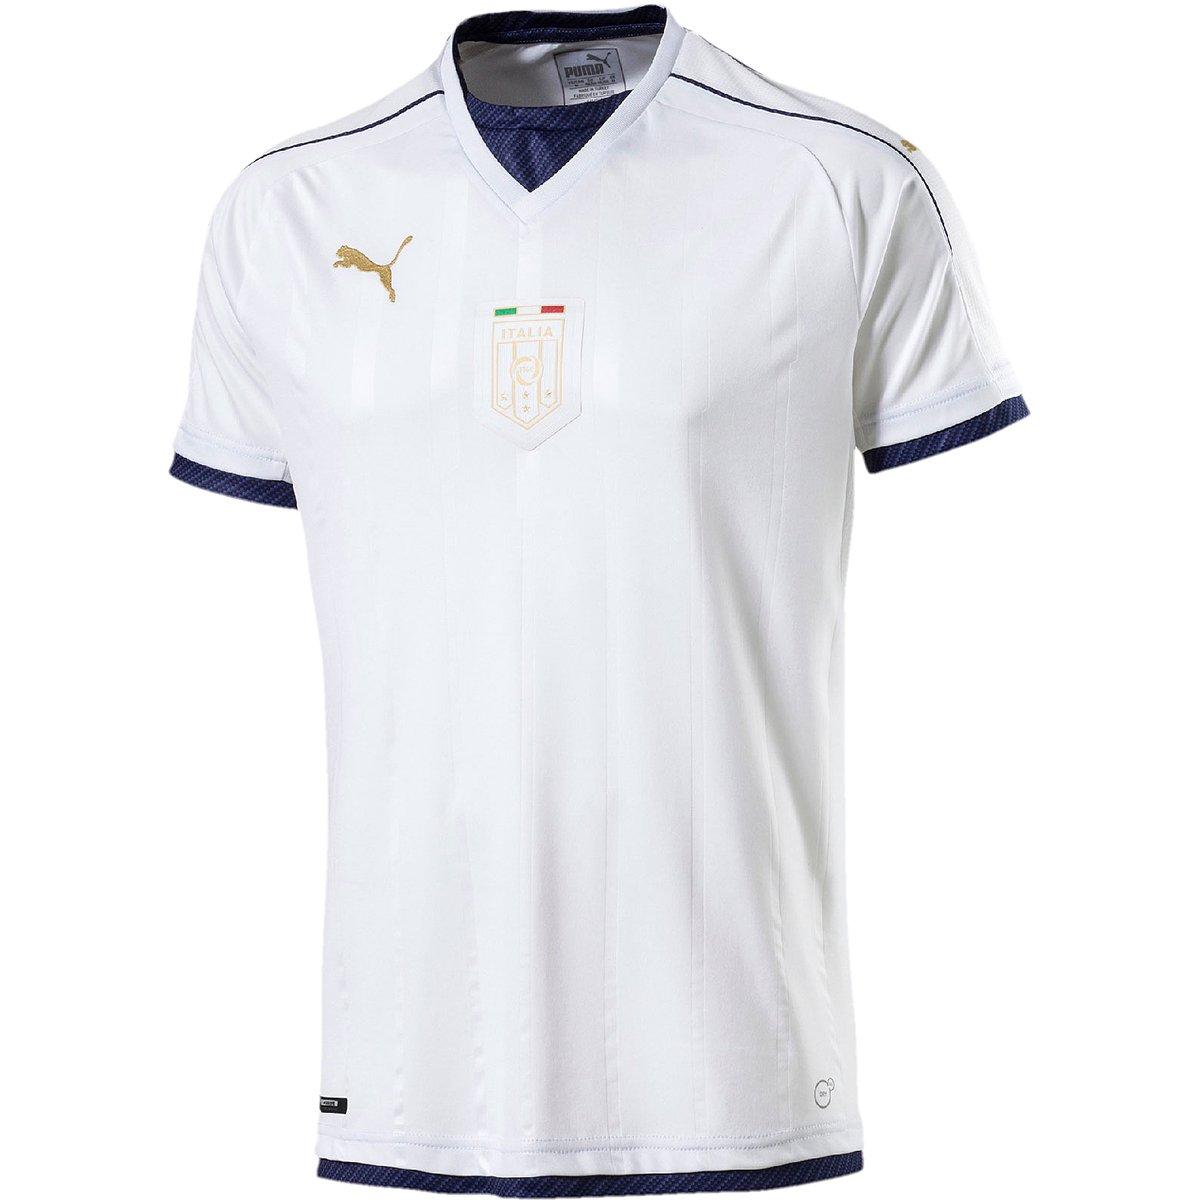 Camisa Itália Away 16 17 s nº Torcedor Puma Masculina - Branco ... b4a6b585cc449